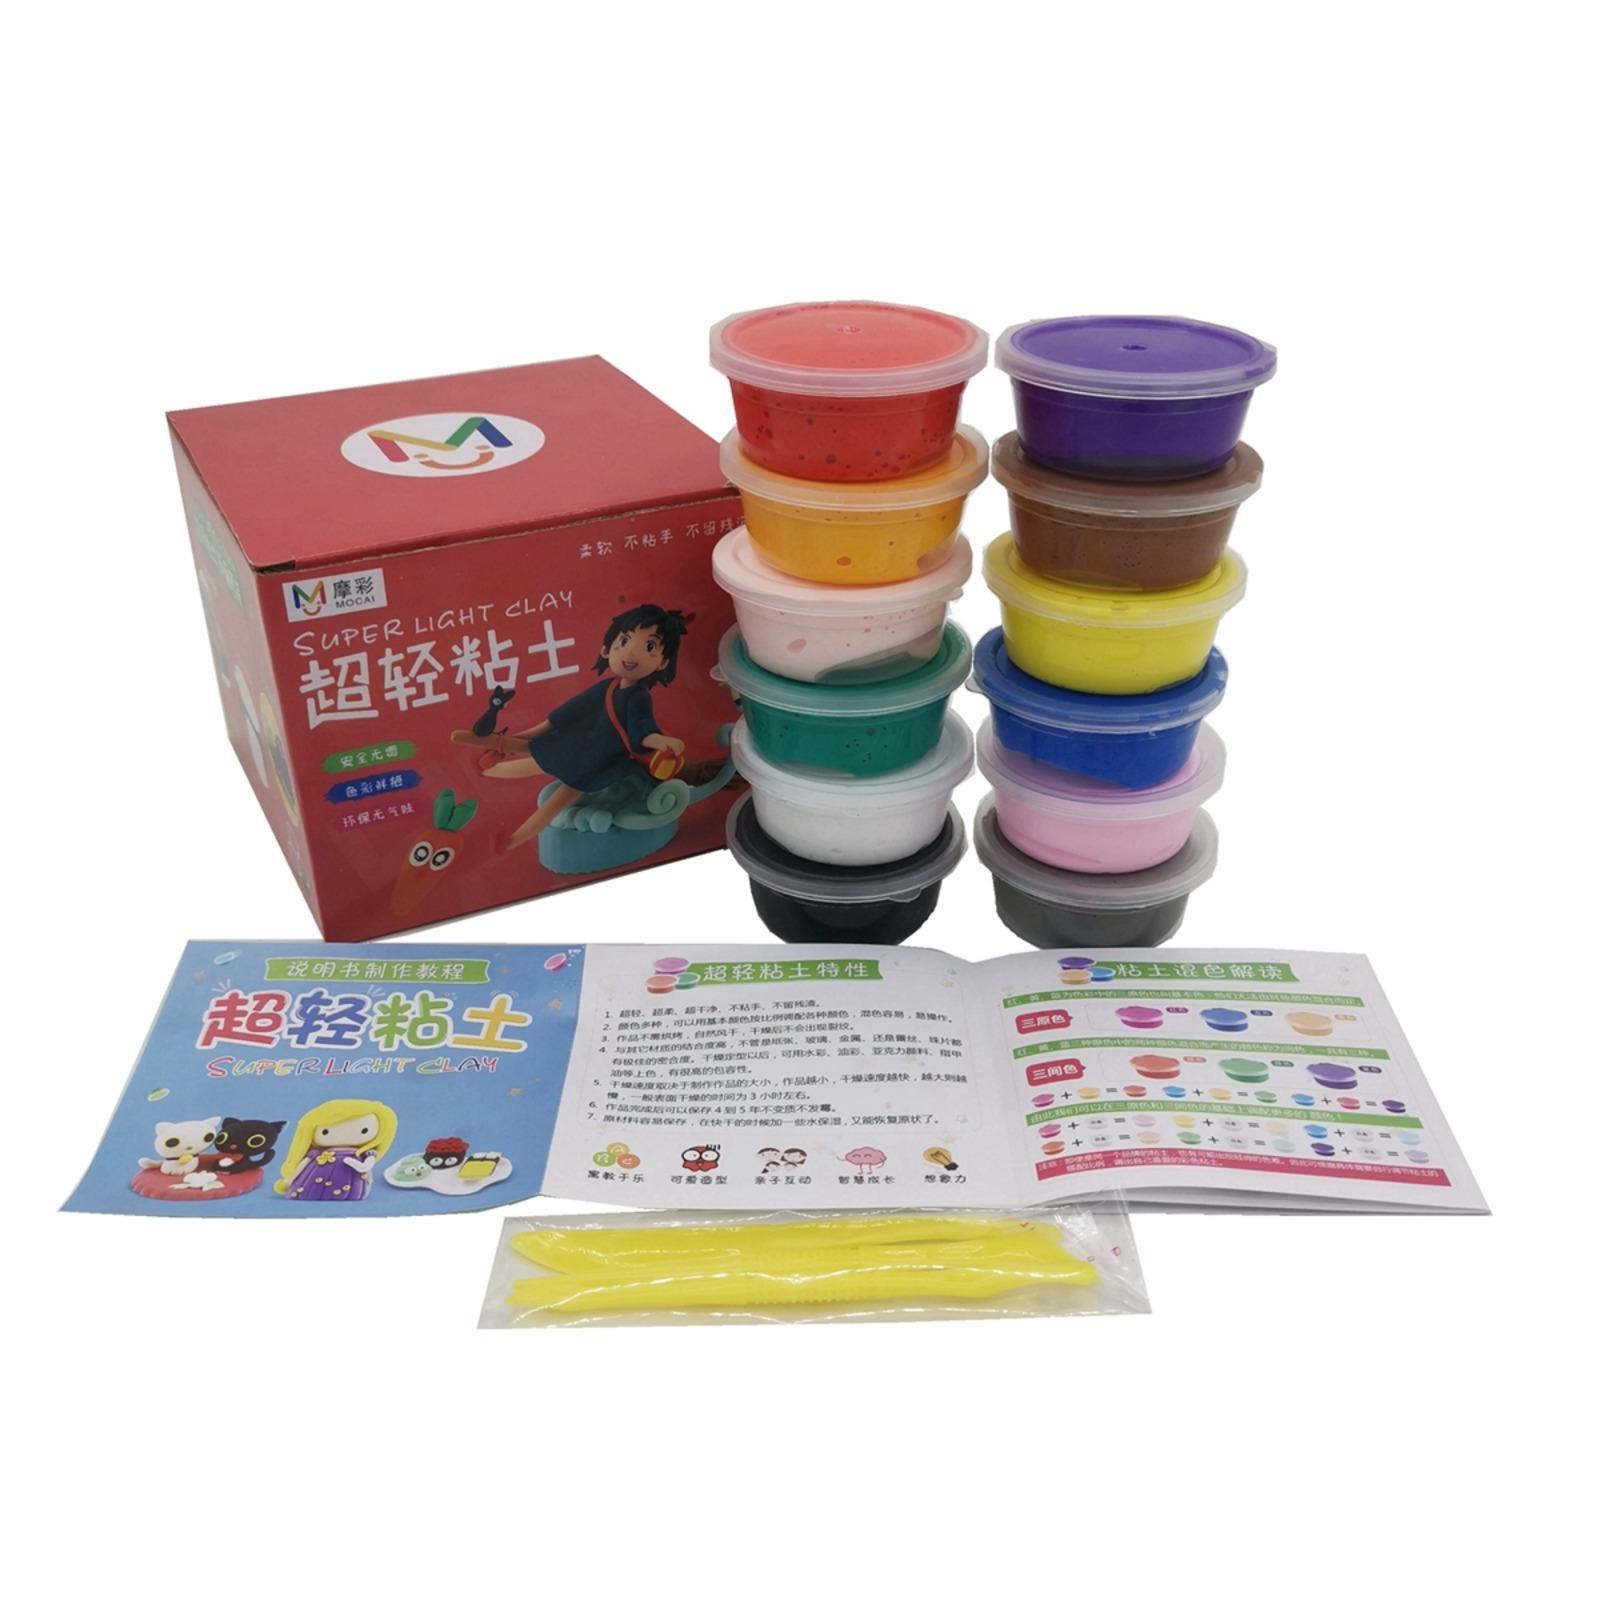 Super Light Clay Mix Colours 12 colors